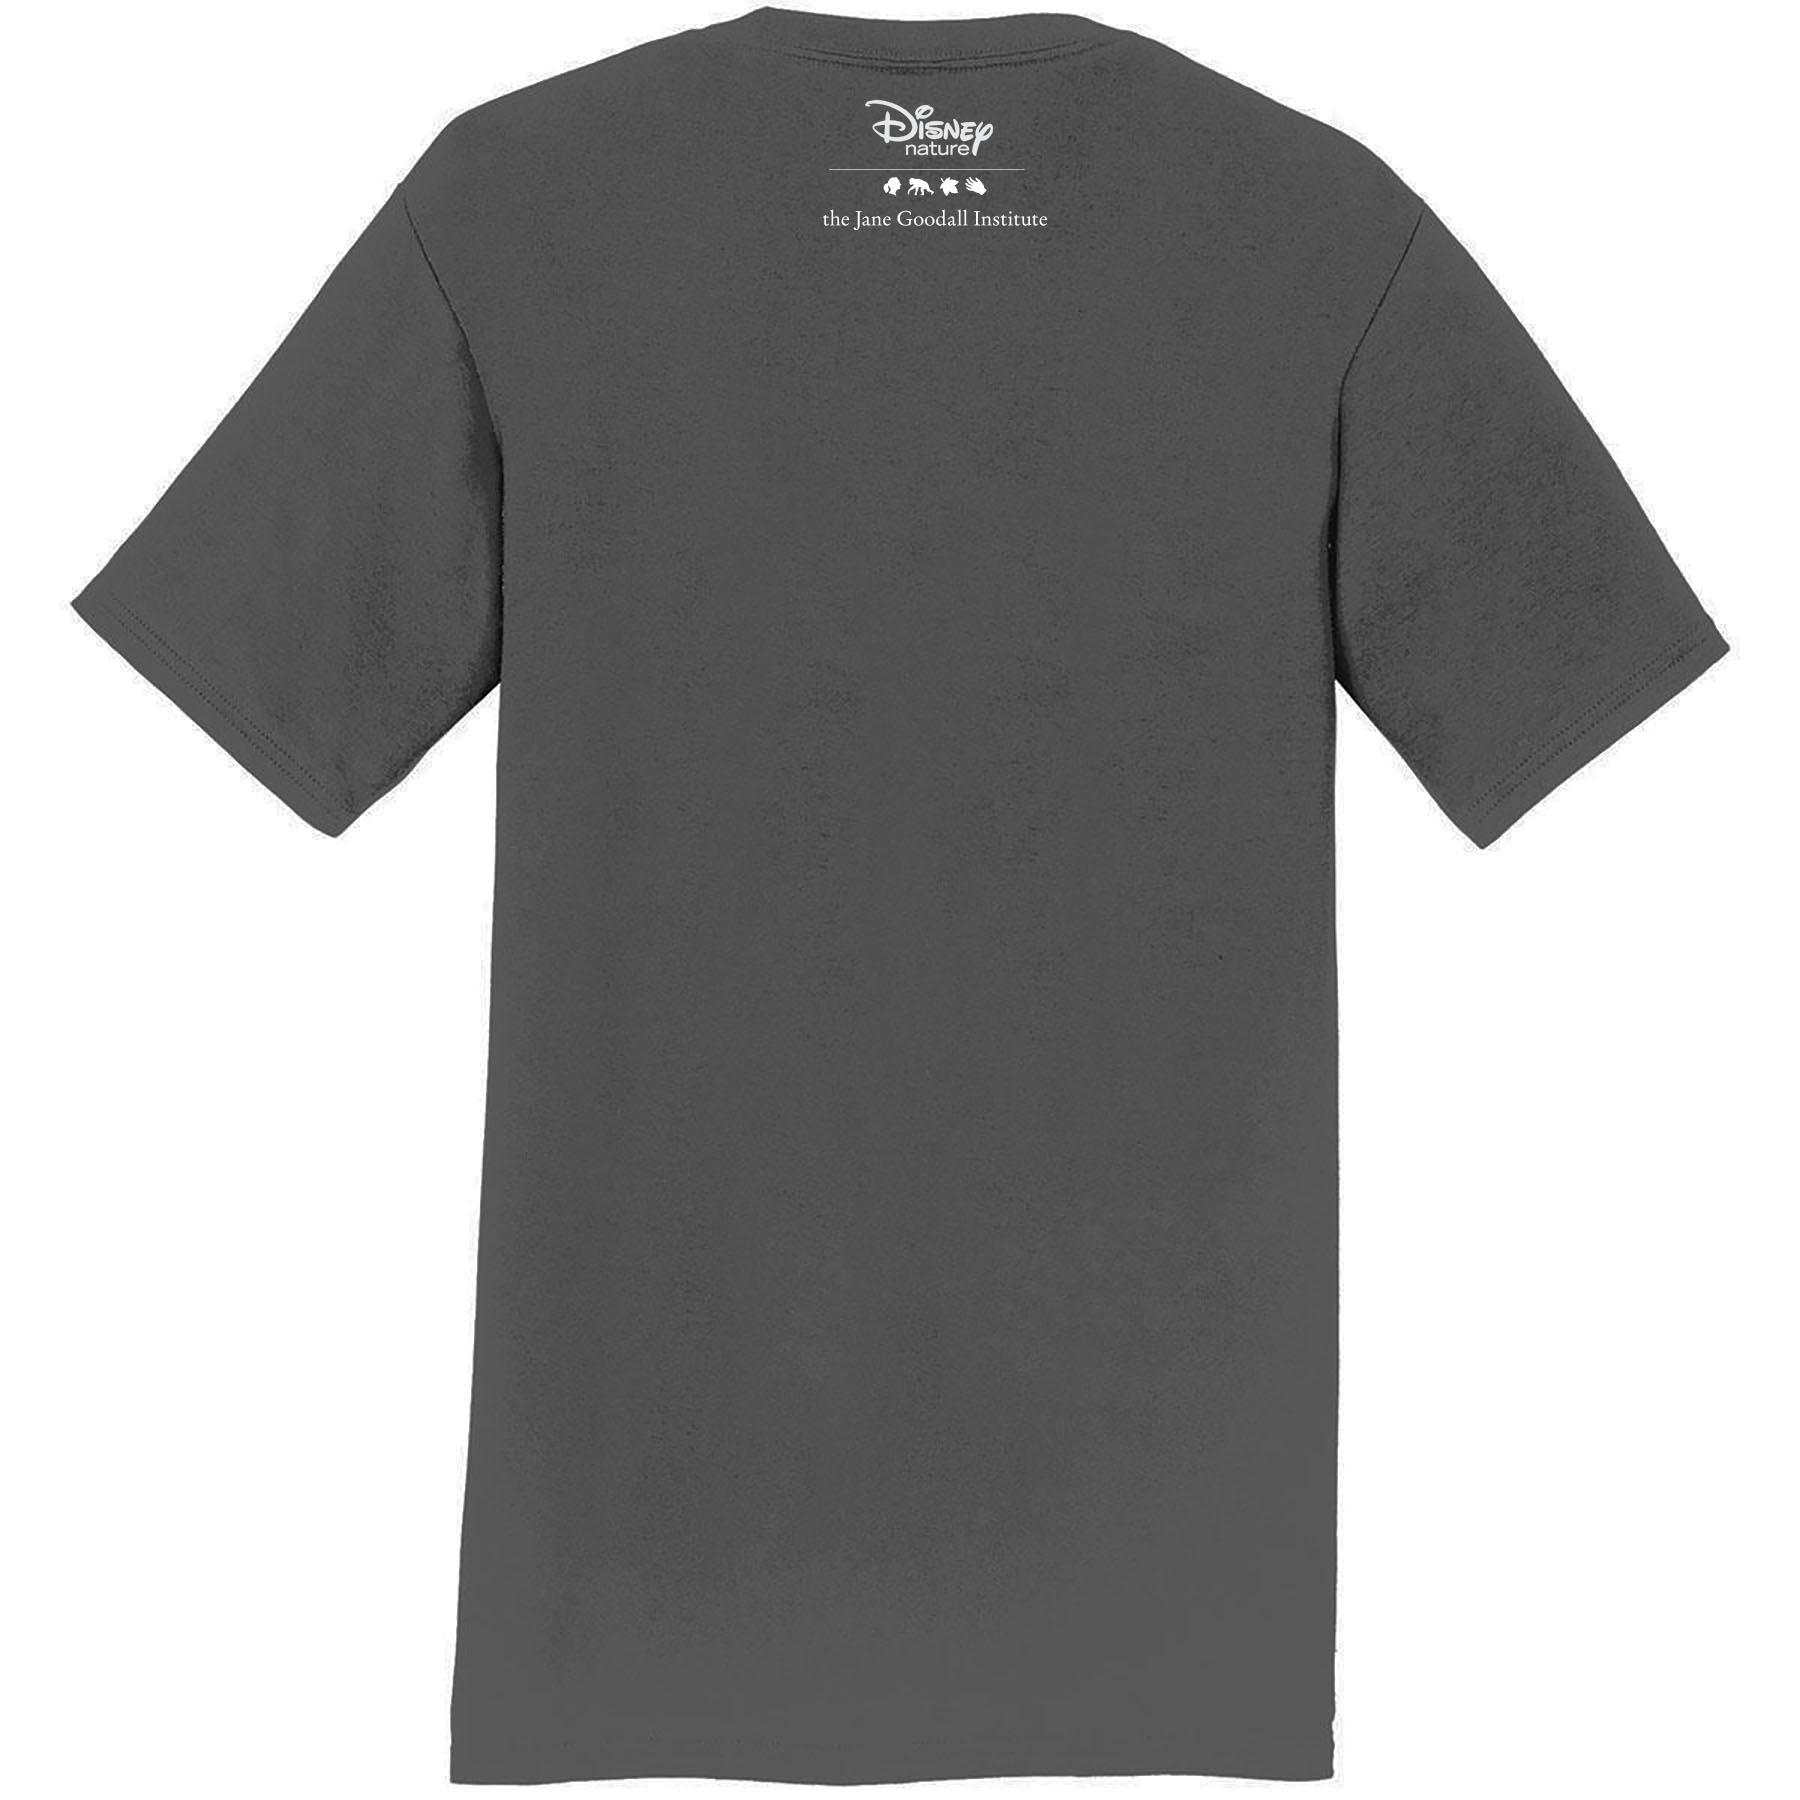 Disneynature + JGI Forever Wild T-Shirt - JGI213